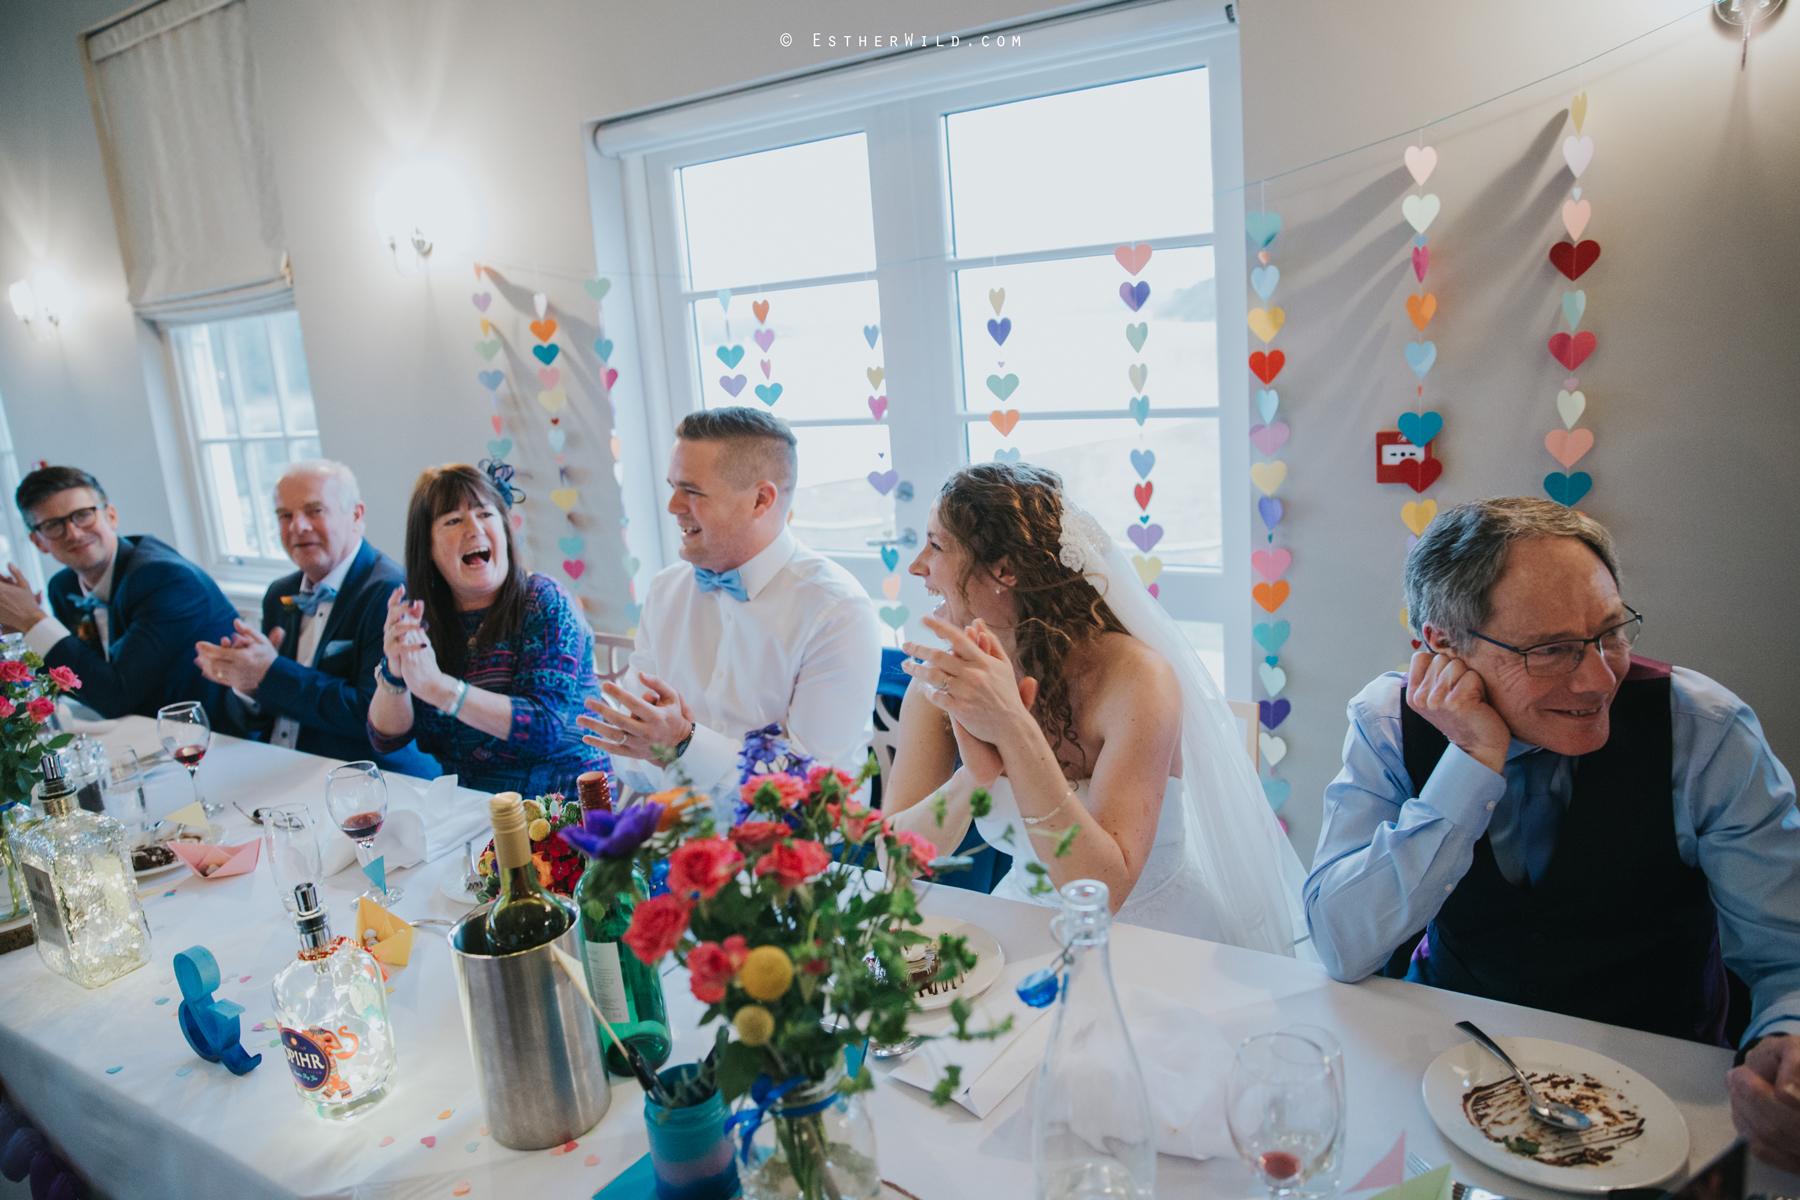 The_BoatHouse_Wedding_Venue_Ormesby_Norfolk_Broads_Boat_Wedding_Photography_Esther_Wild_Photographer_IMG_2314.jpg